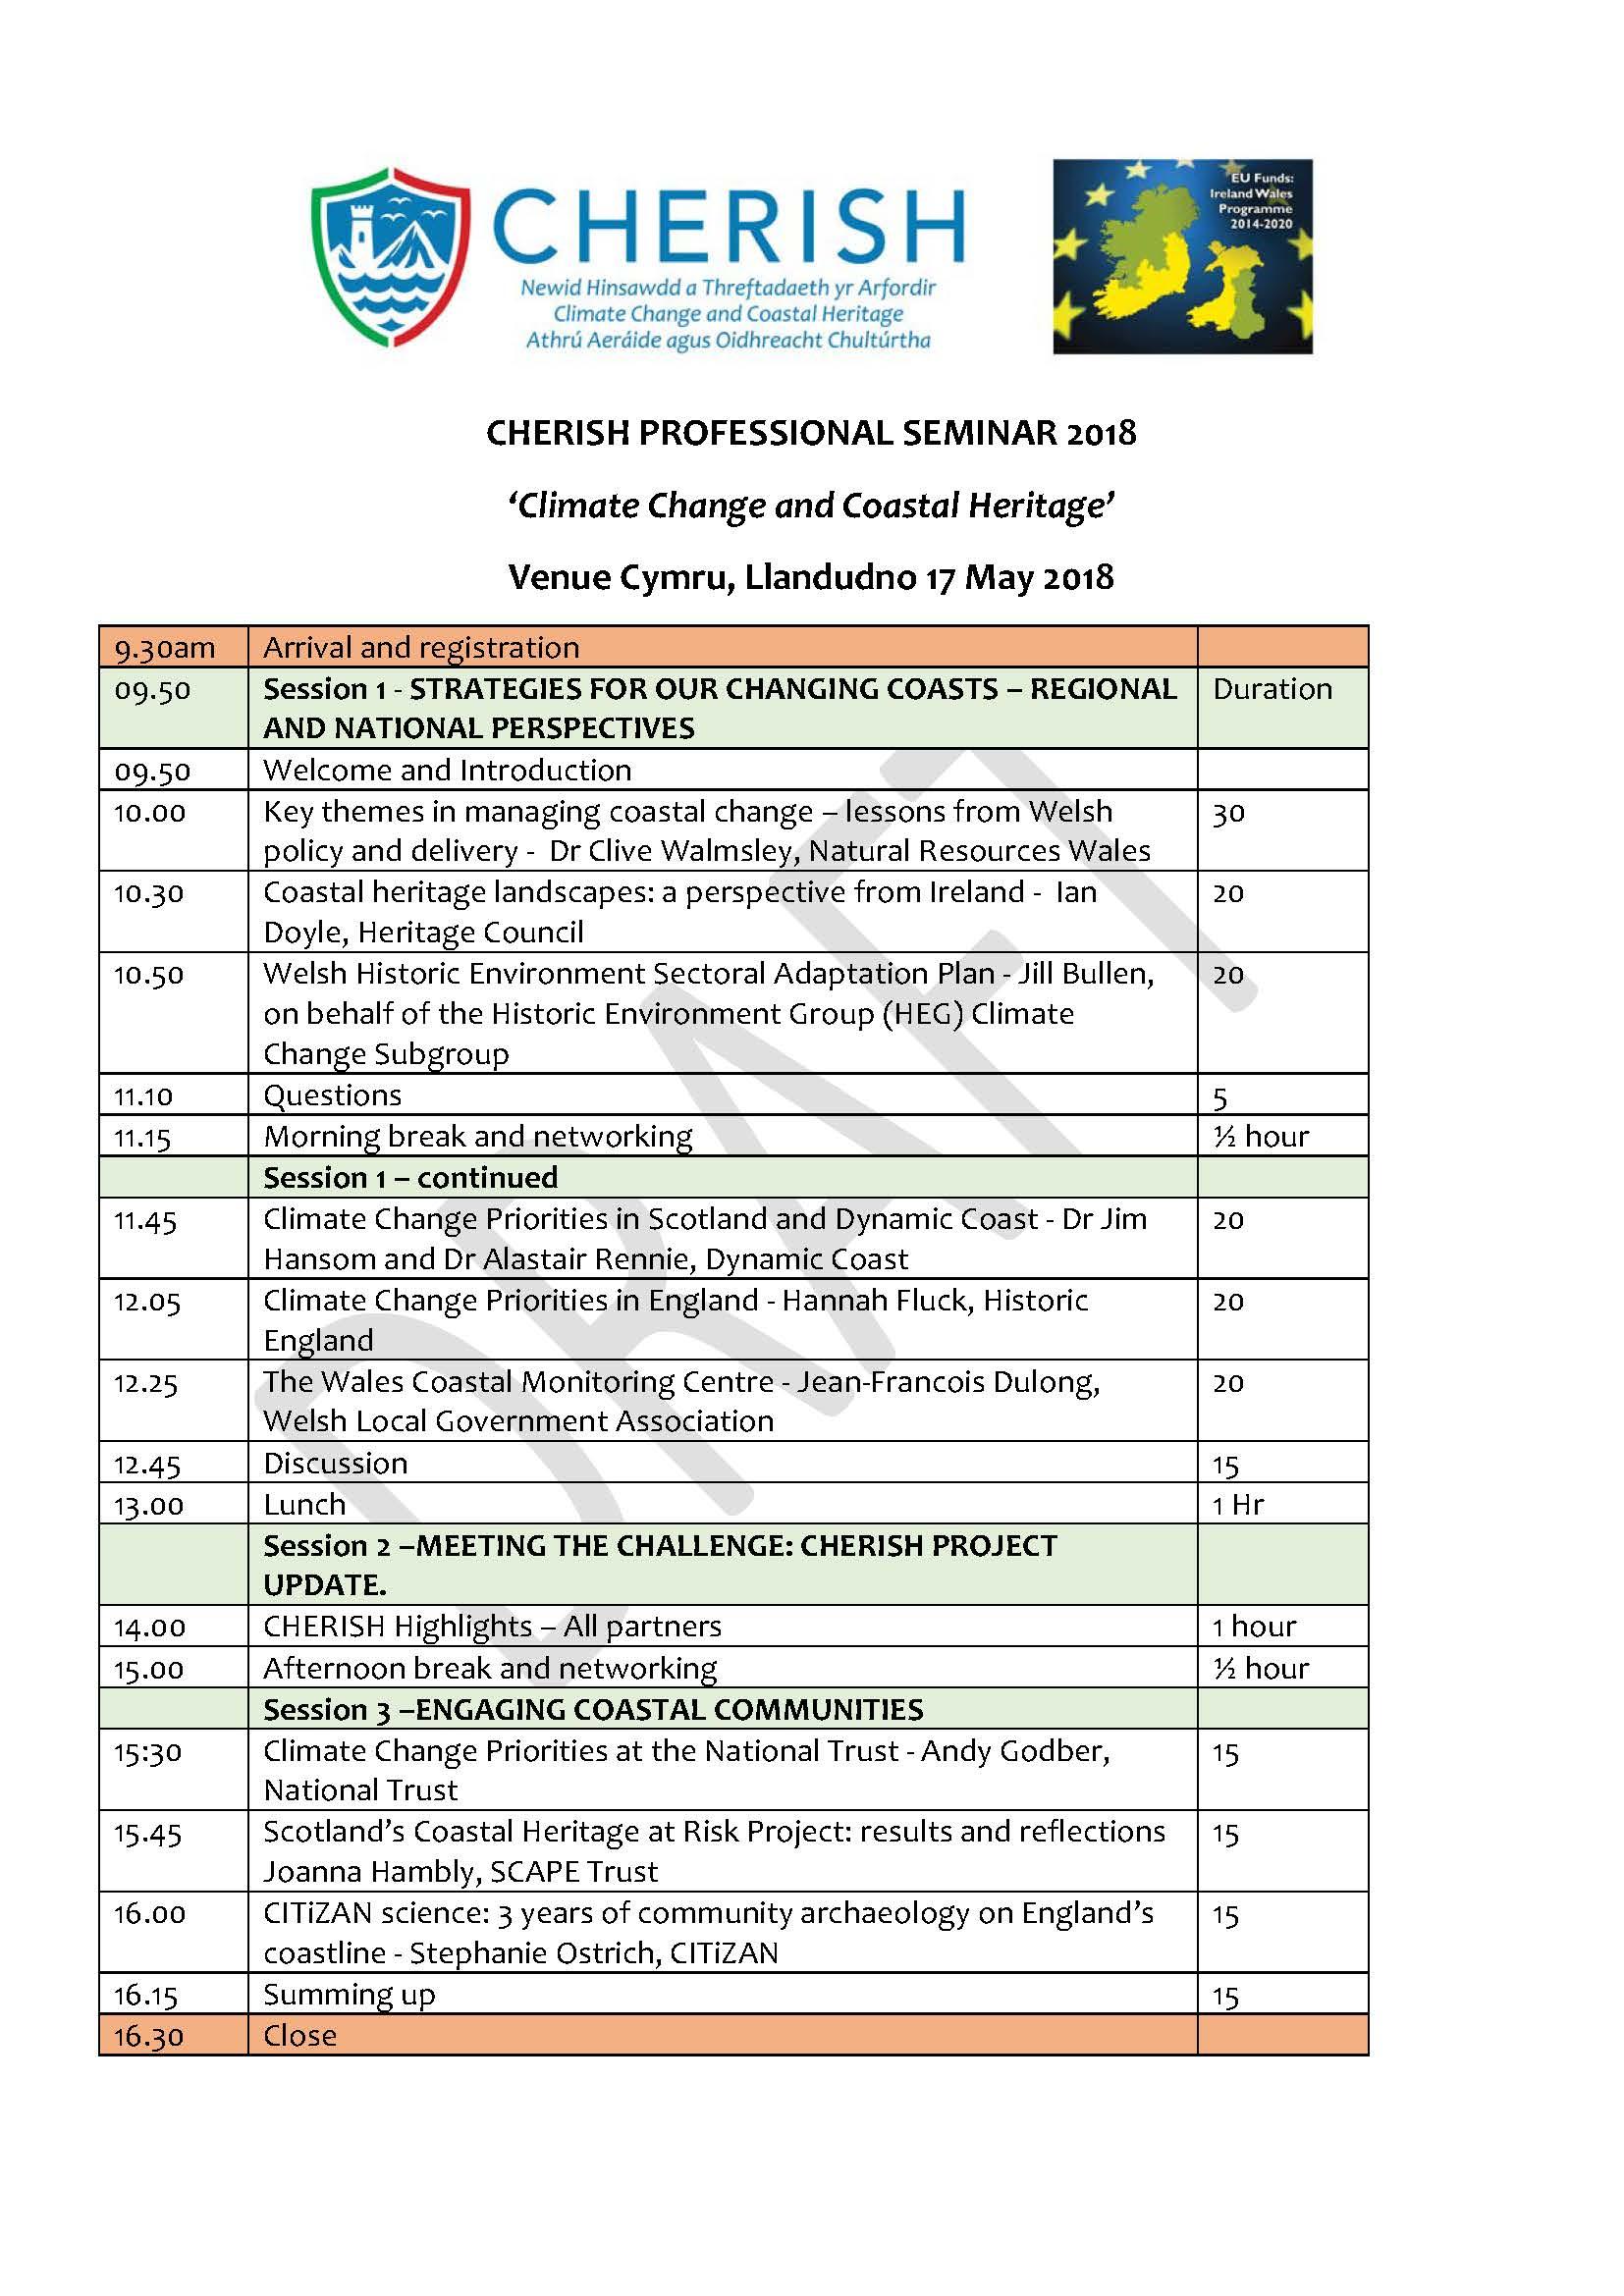 Professional Seminar Programme